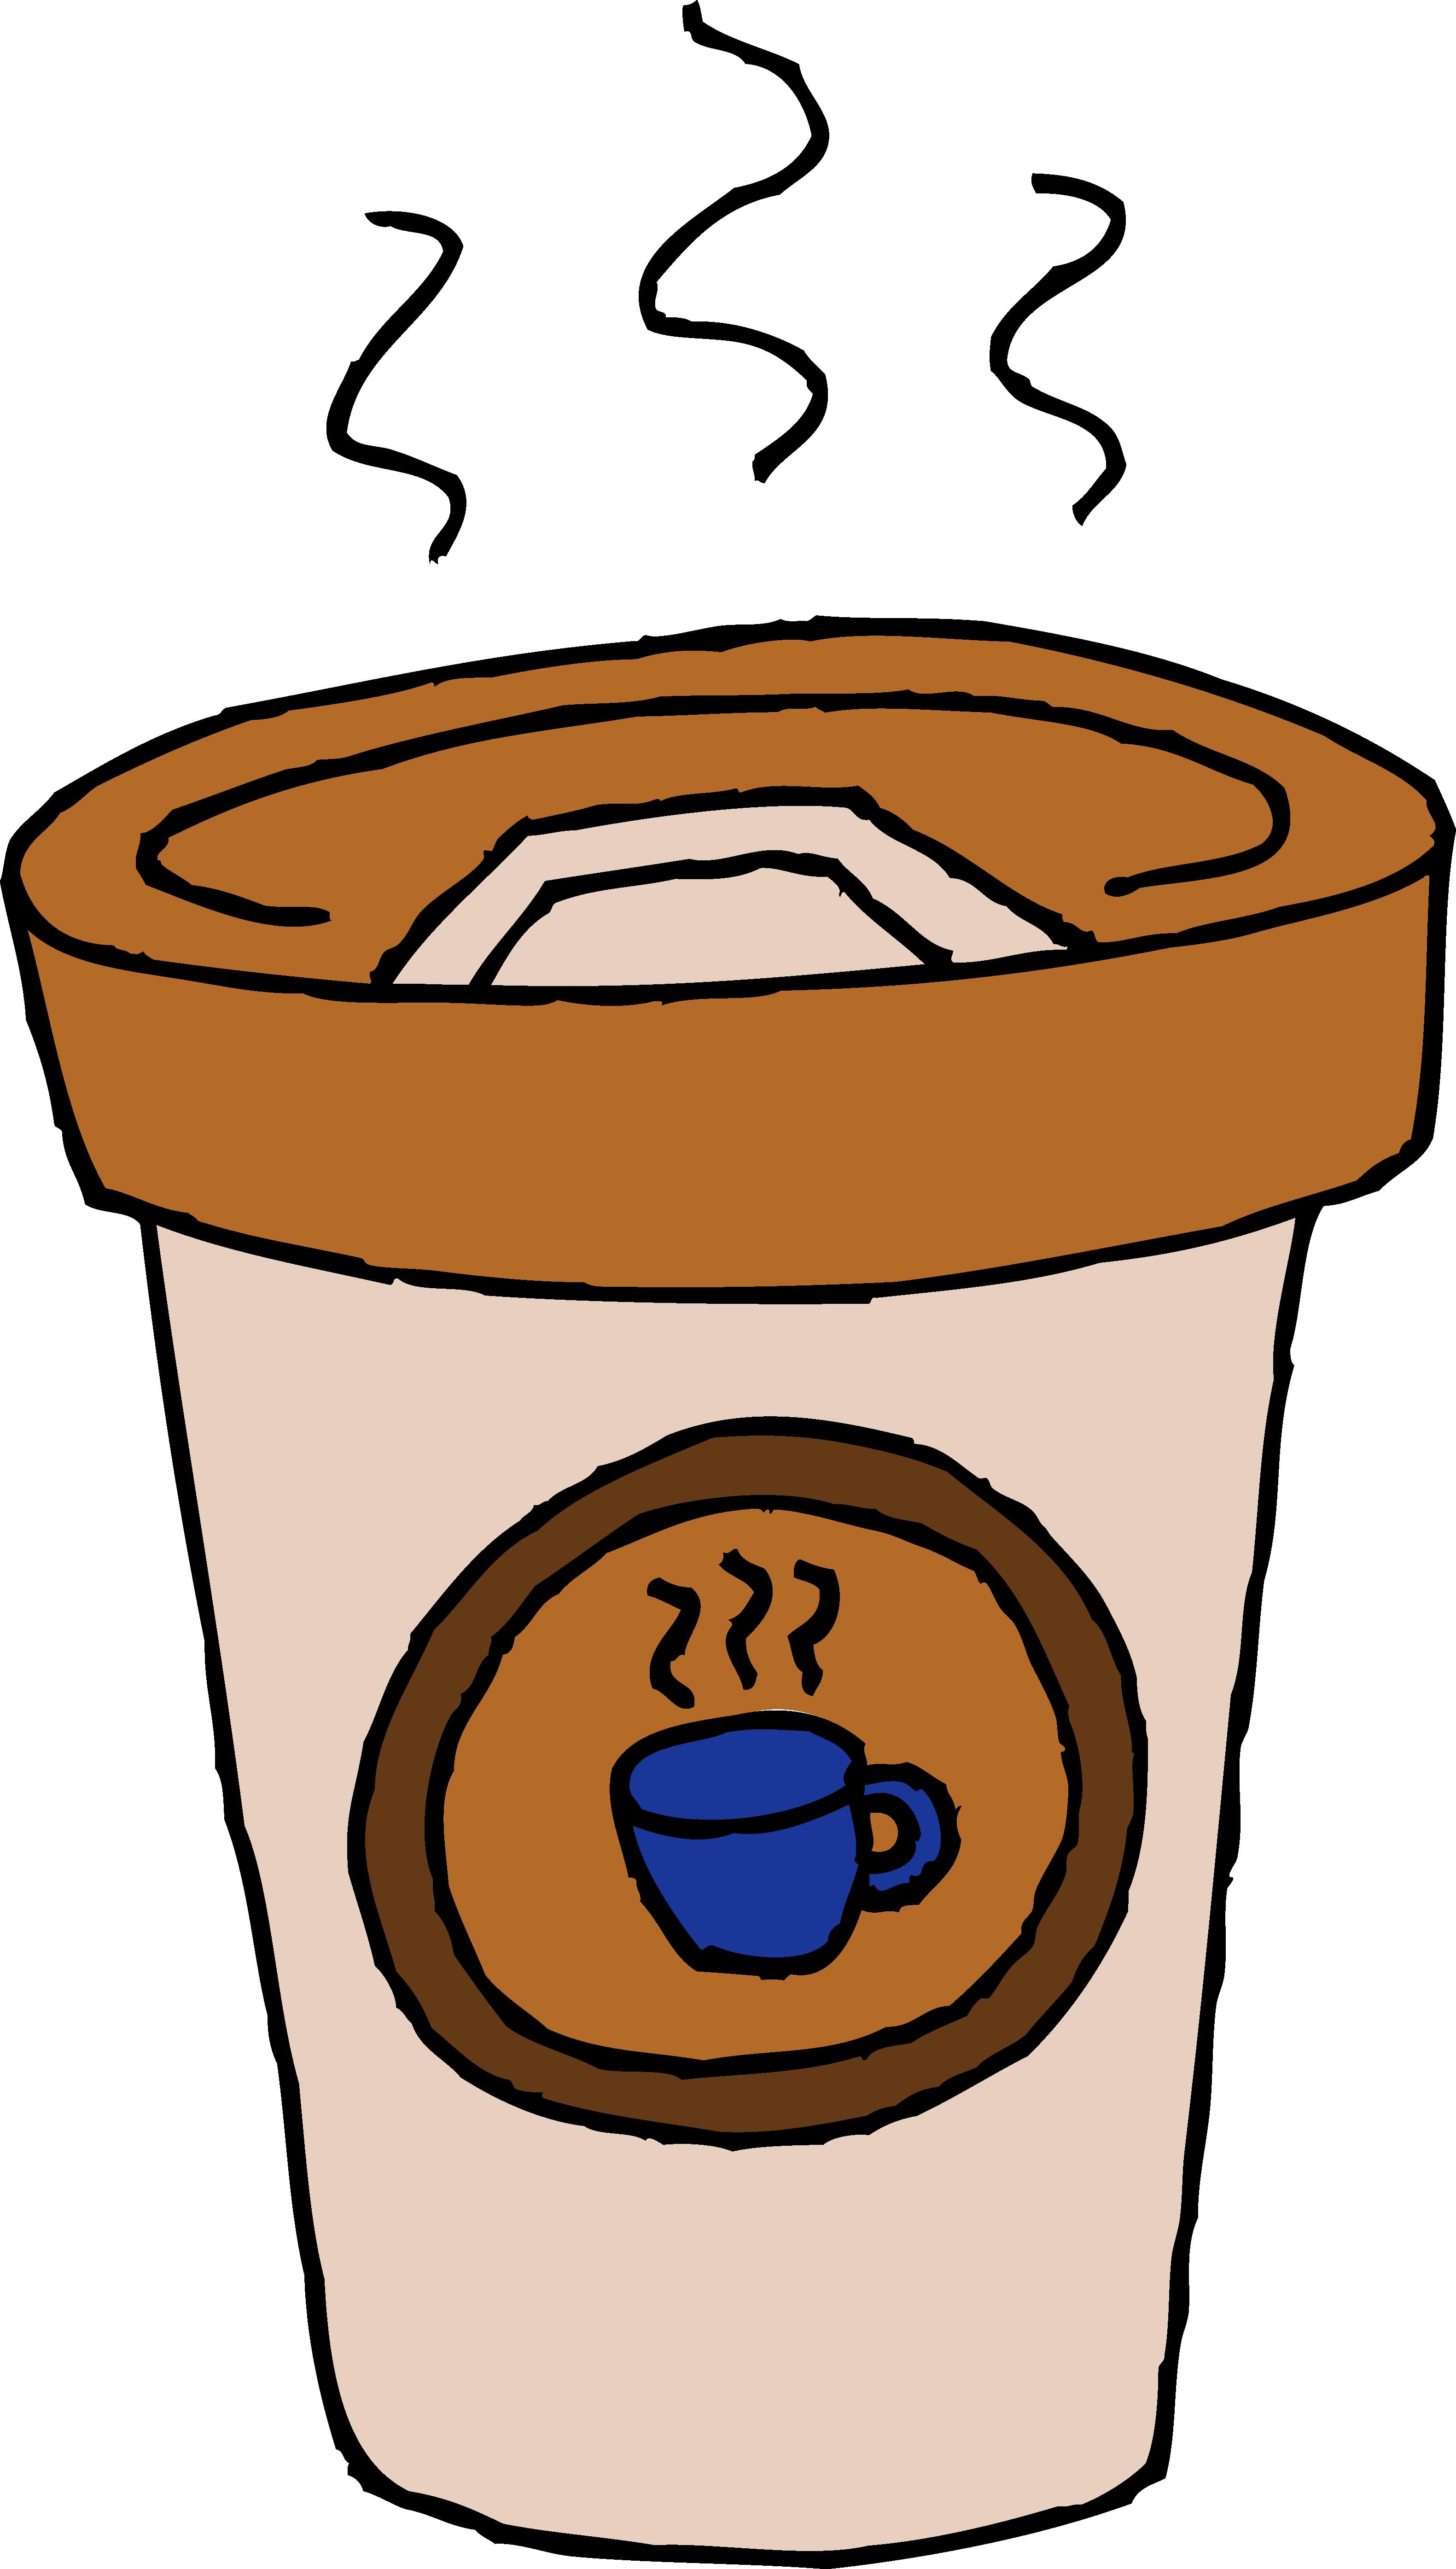 3162x5578 Hot Cafe Latte Clip Art Clipart Panda